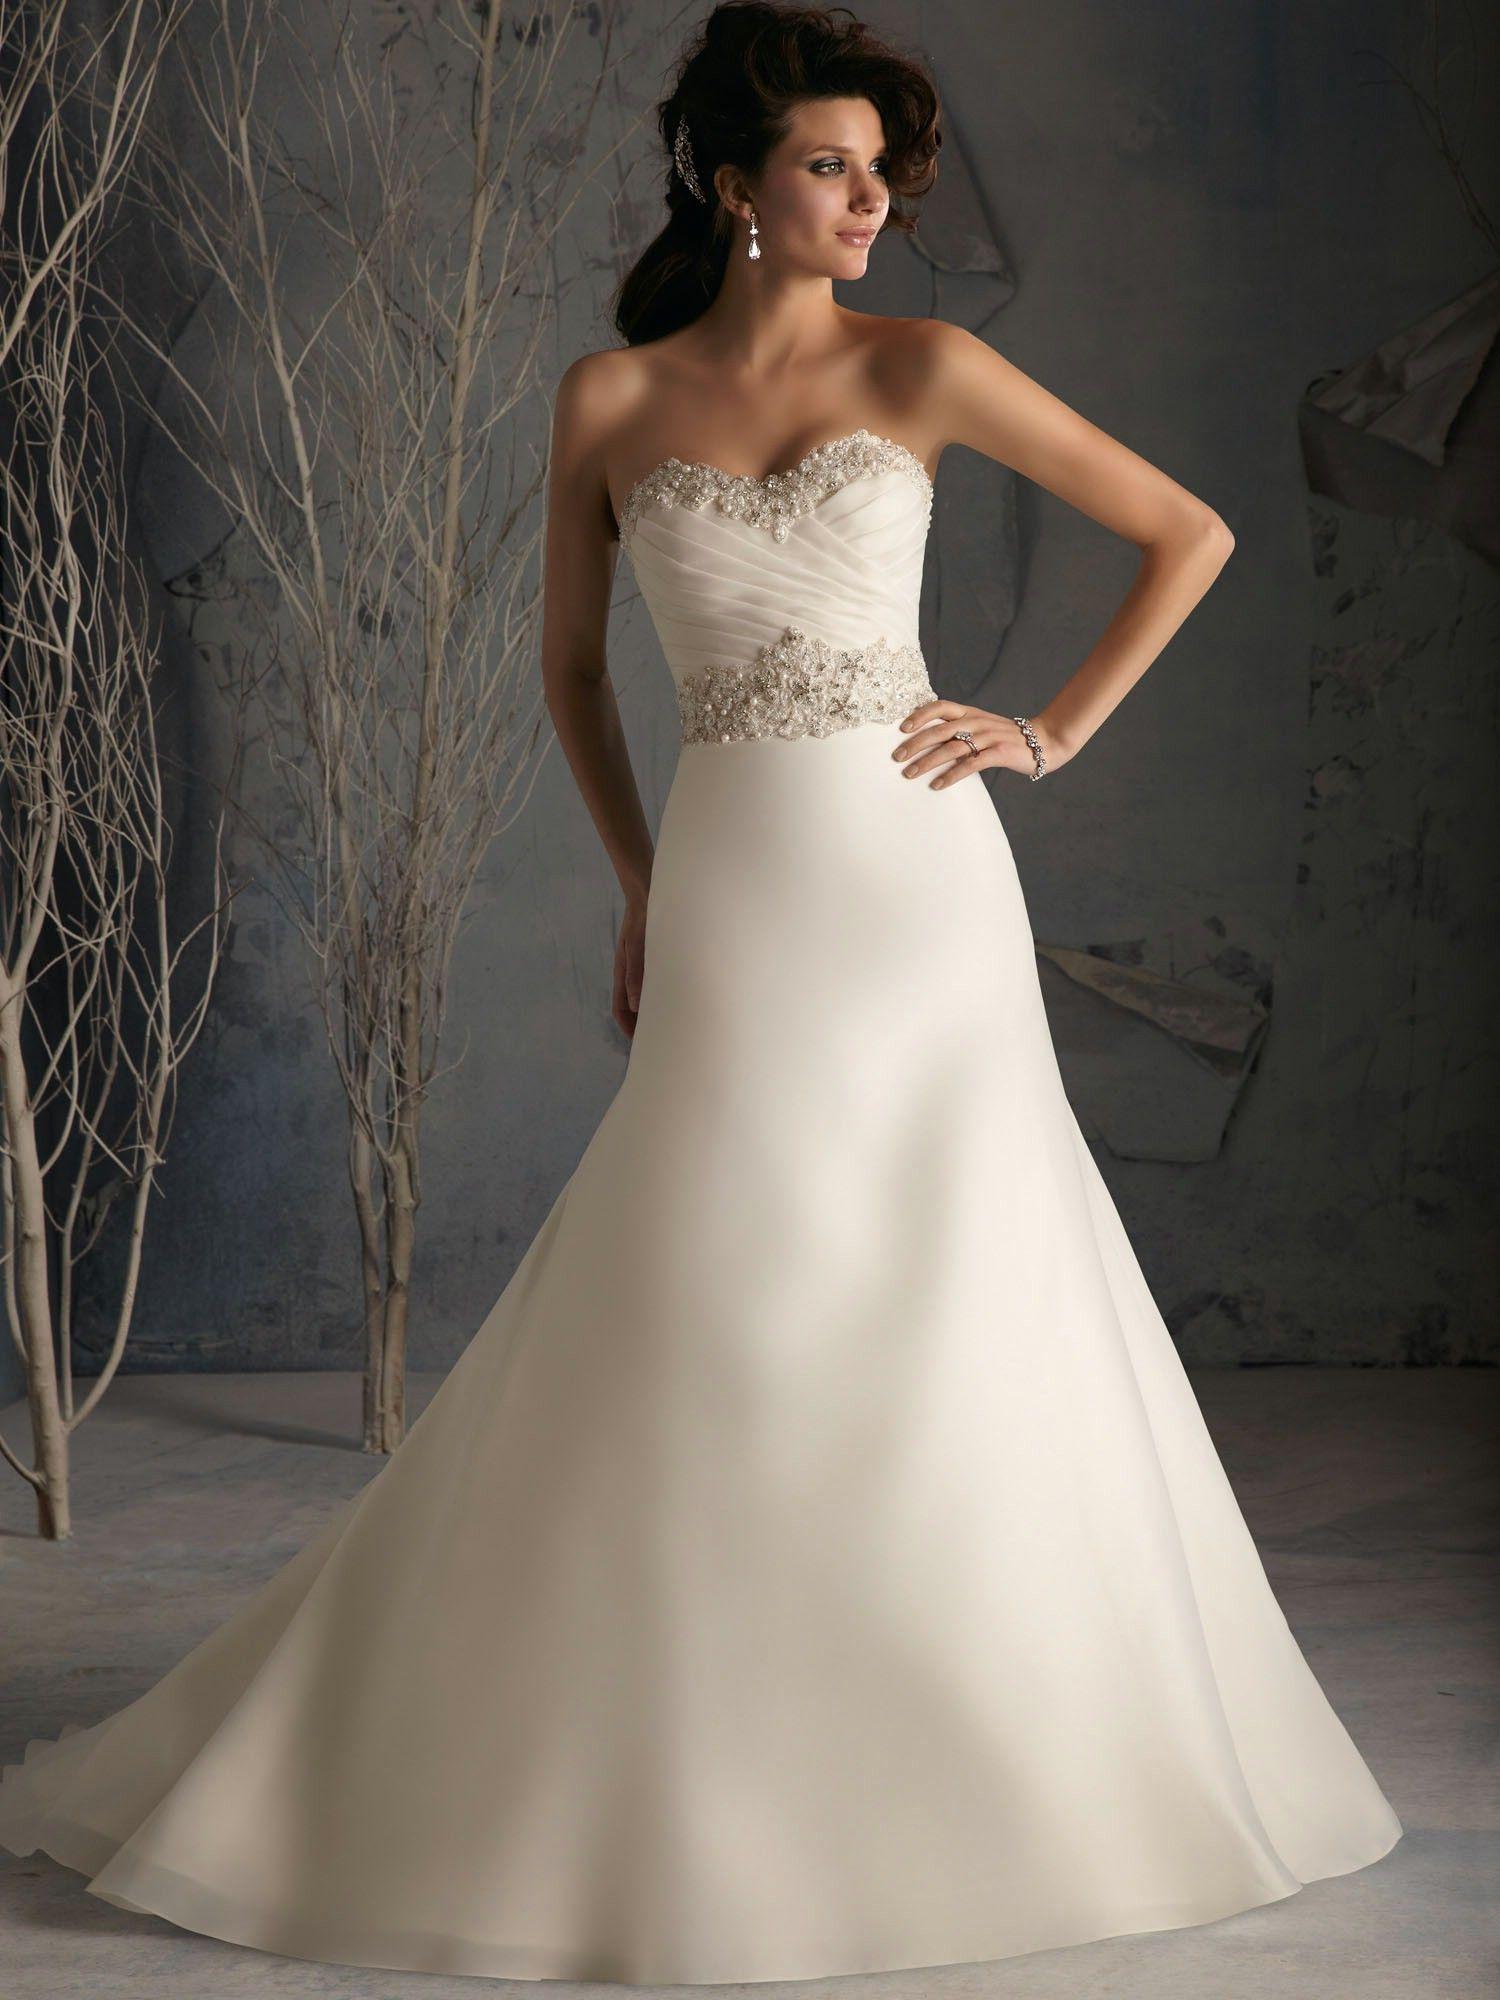 Mori Lee Blu Wedding Dresses - Style 5171 #wedding #dresses #morilee ...